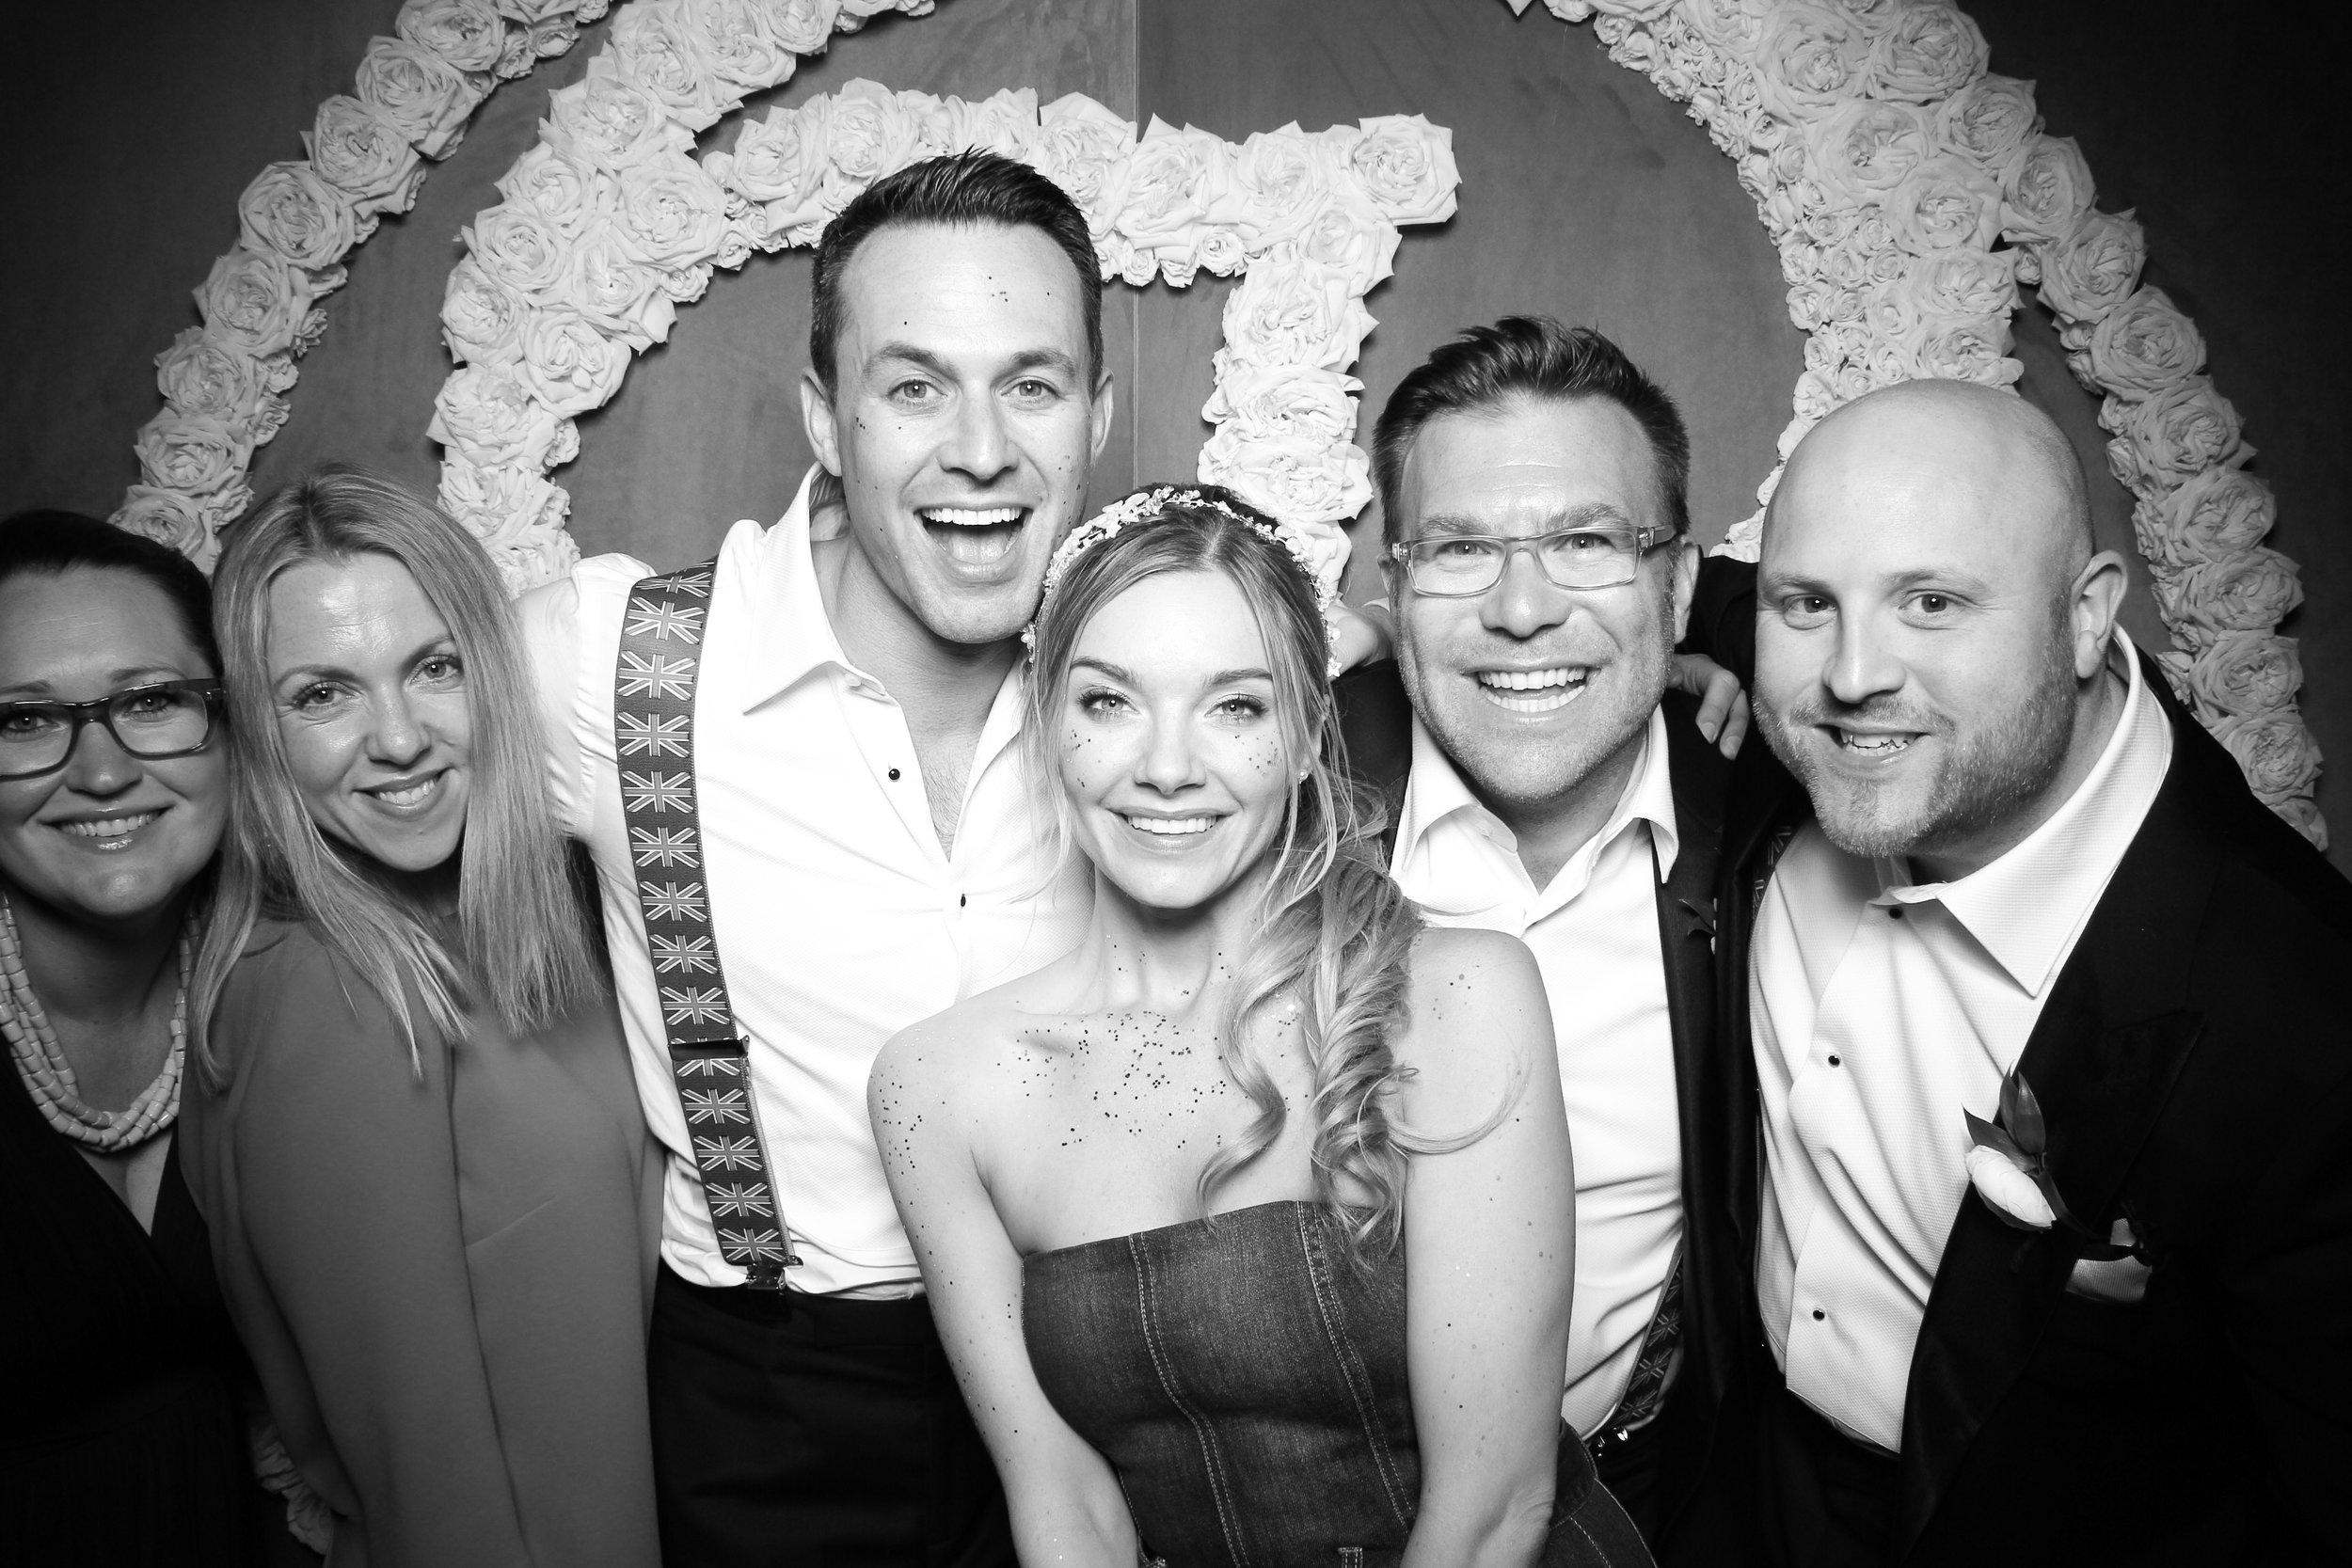 Photo_Booth_Rental_At_Standard_Club_Wedding_Chicago_14.jpg